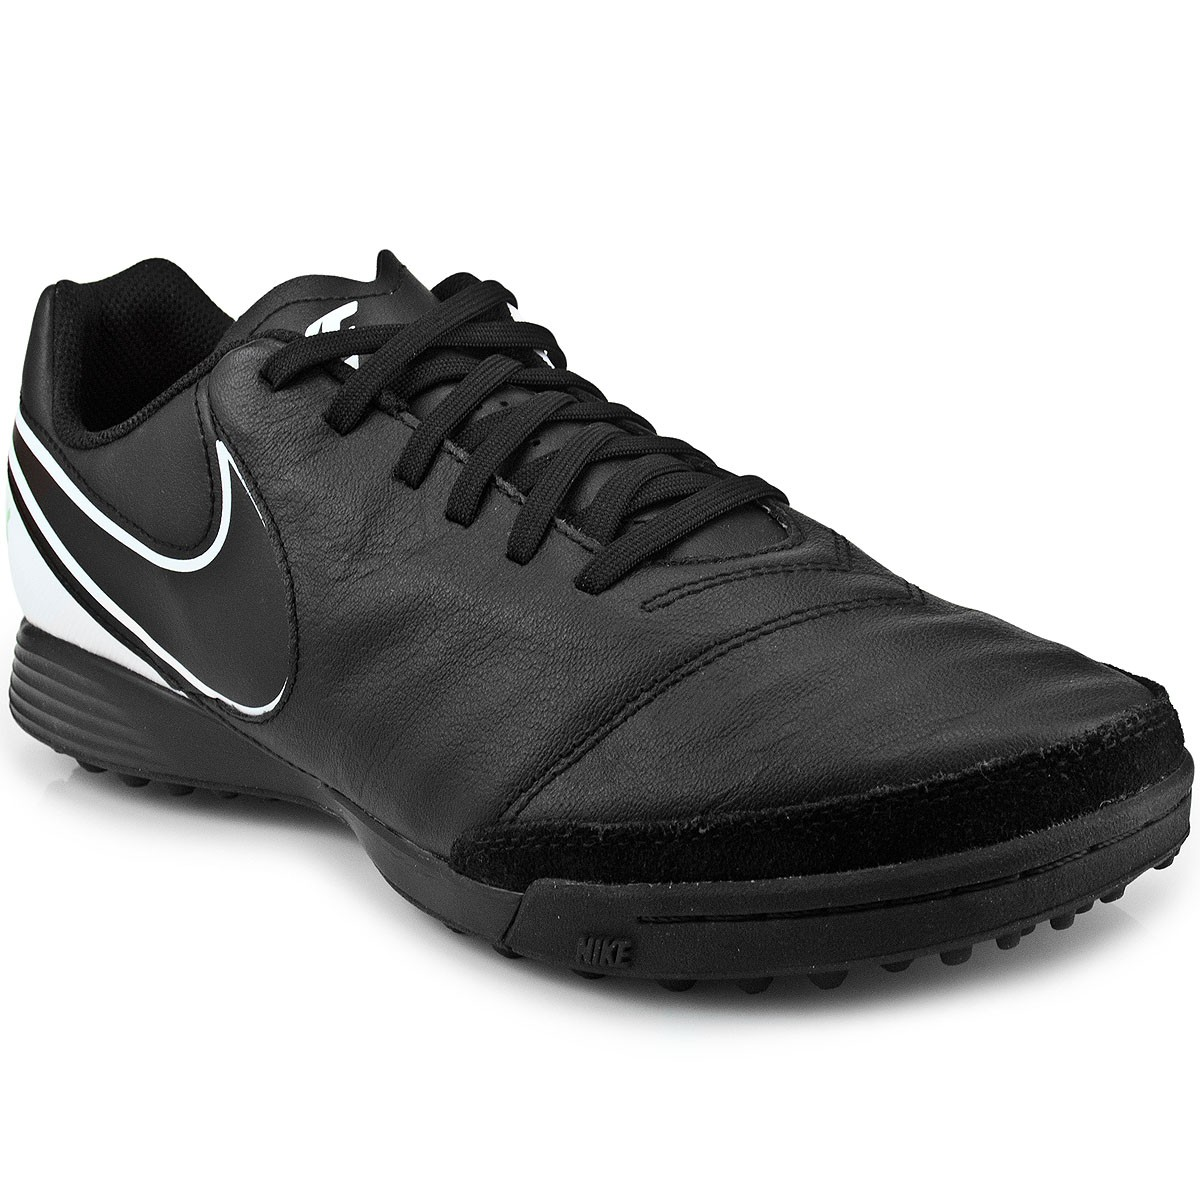 Chuteira Nike Tiempo Genio II Leather TF  ae158c1f5a154